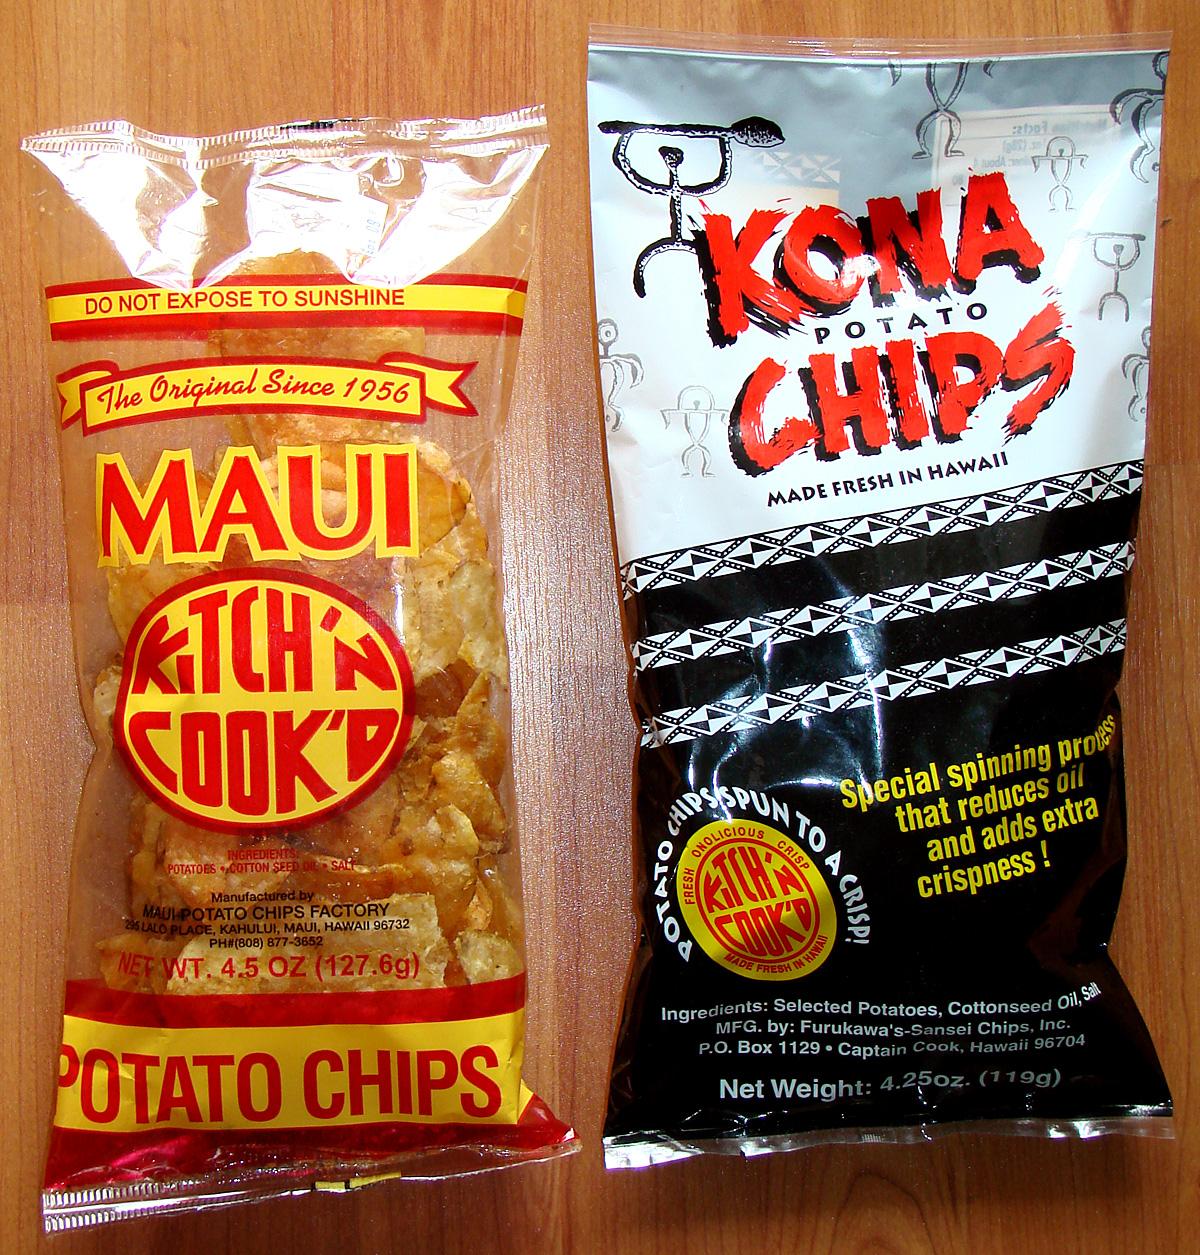 Kona Potato Chips… Now Available at Manoa Longs! | Pomai Test Blog